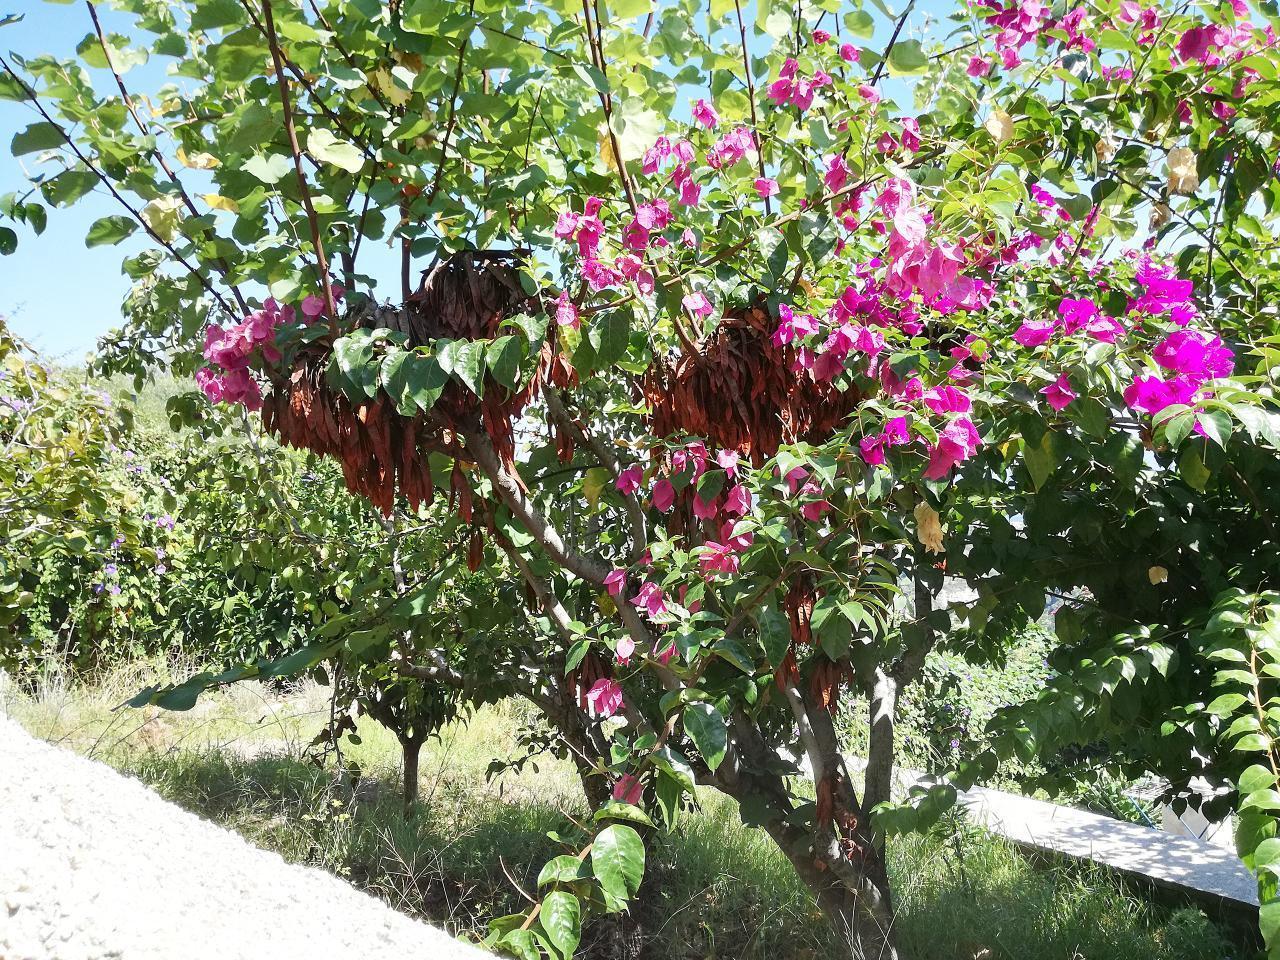 Maison de vacances Ferienhaushälfte Solandra auf sizilianischer Insel mit atemberaubenden Meeres-Rundblick (2038046), Lipari, Lipari, Sicile, Italie, image 37